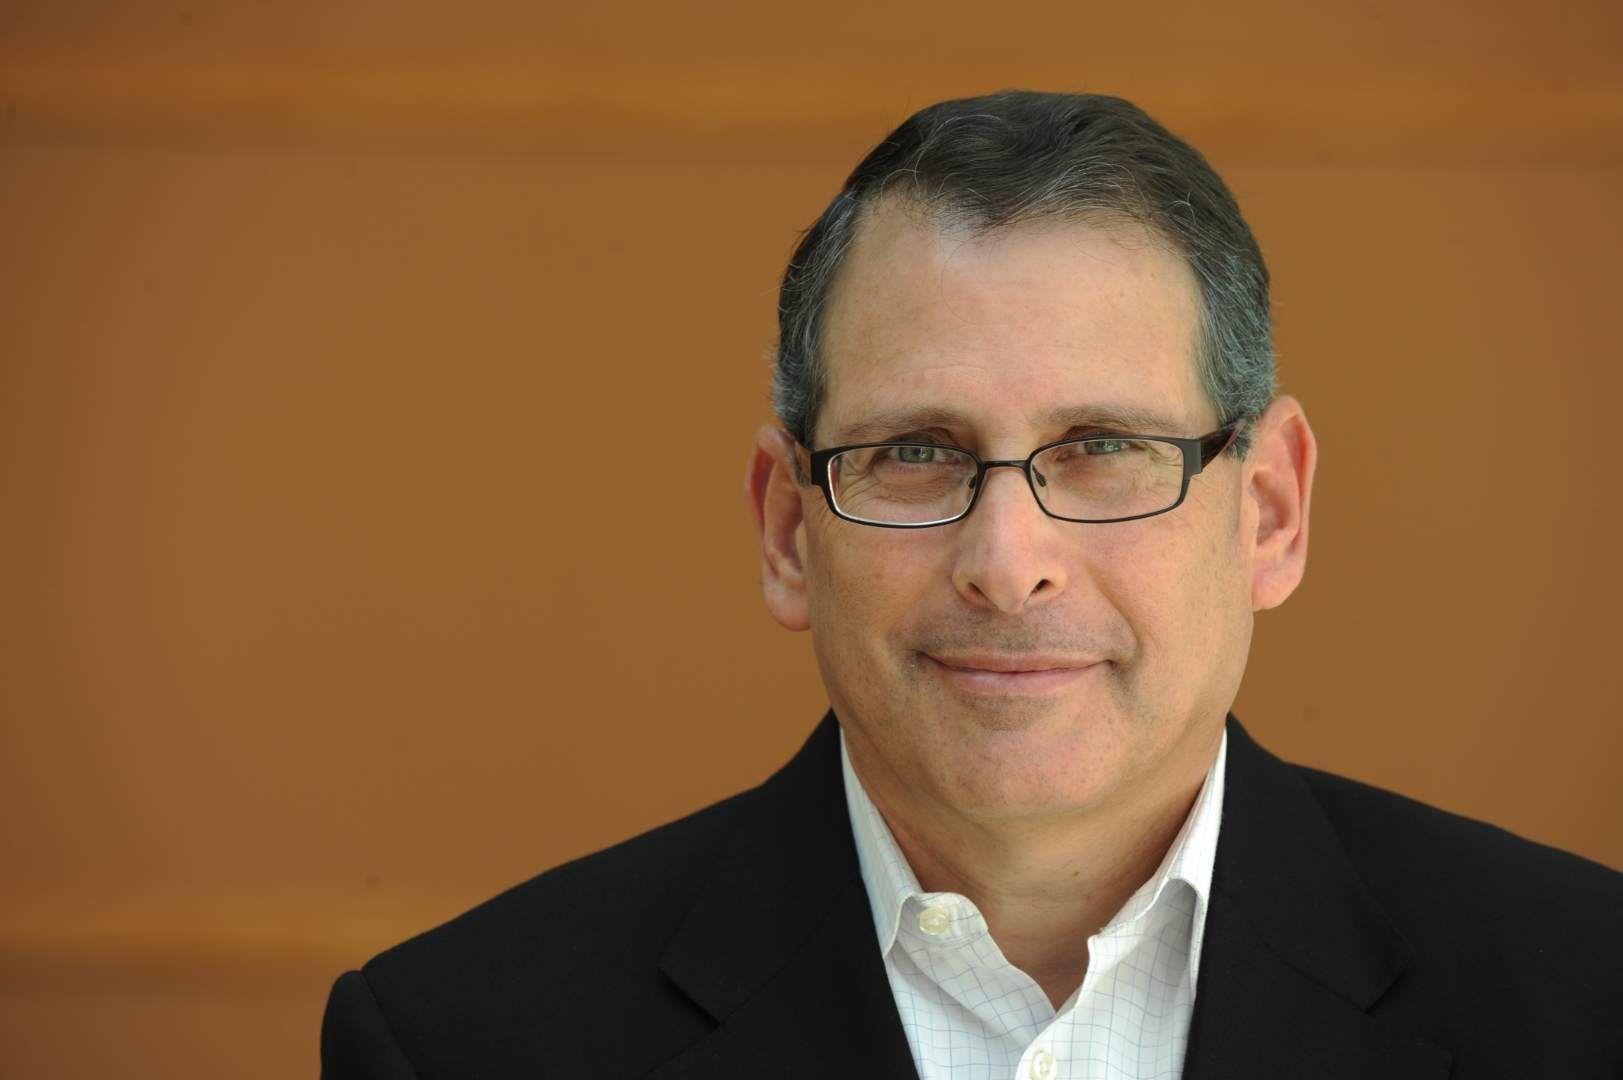 El prestigioso economista Martin Eichenbaum da una conferencia en Barcelona invitado por la BGSE